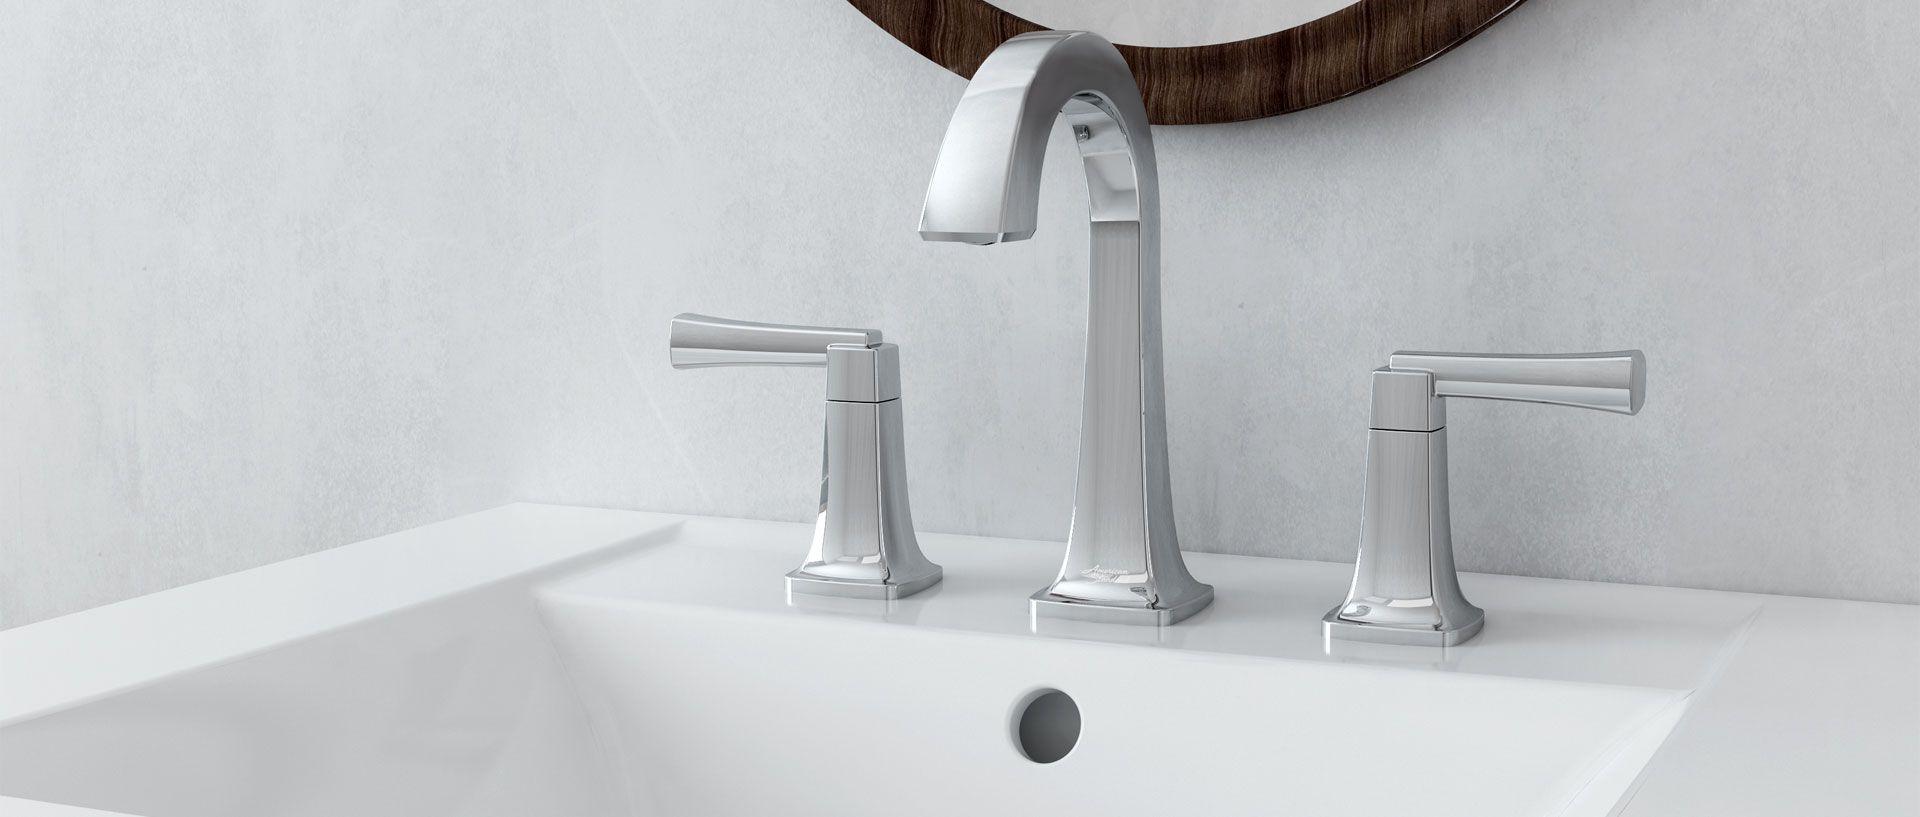 Best Mildew-Resistant Paint for Your Bathroom   Consumer reports ...